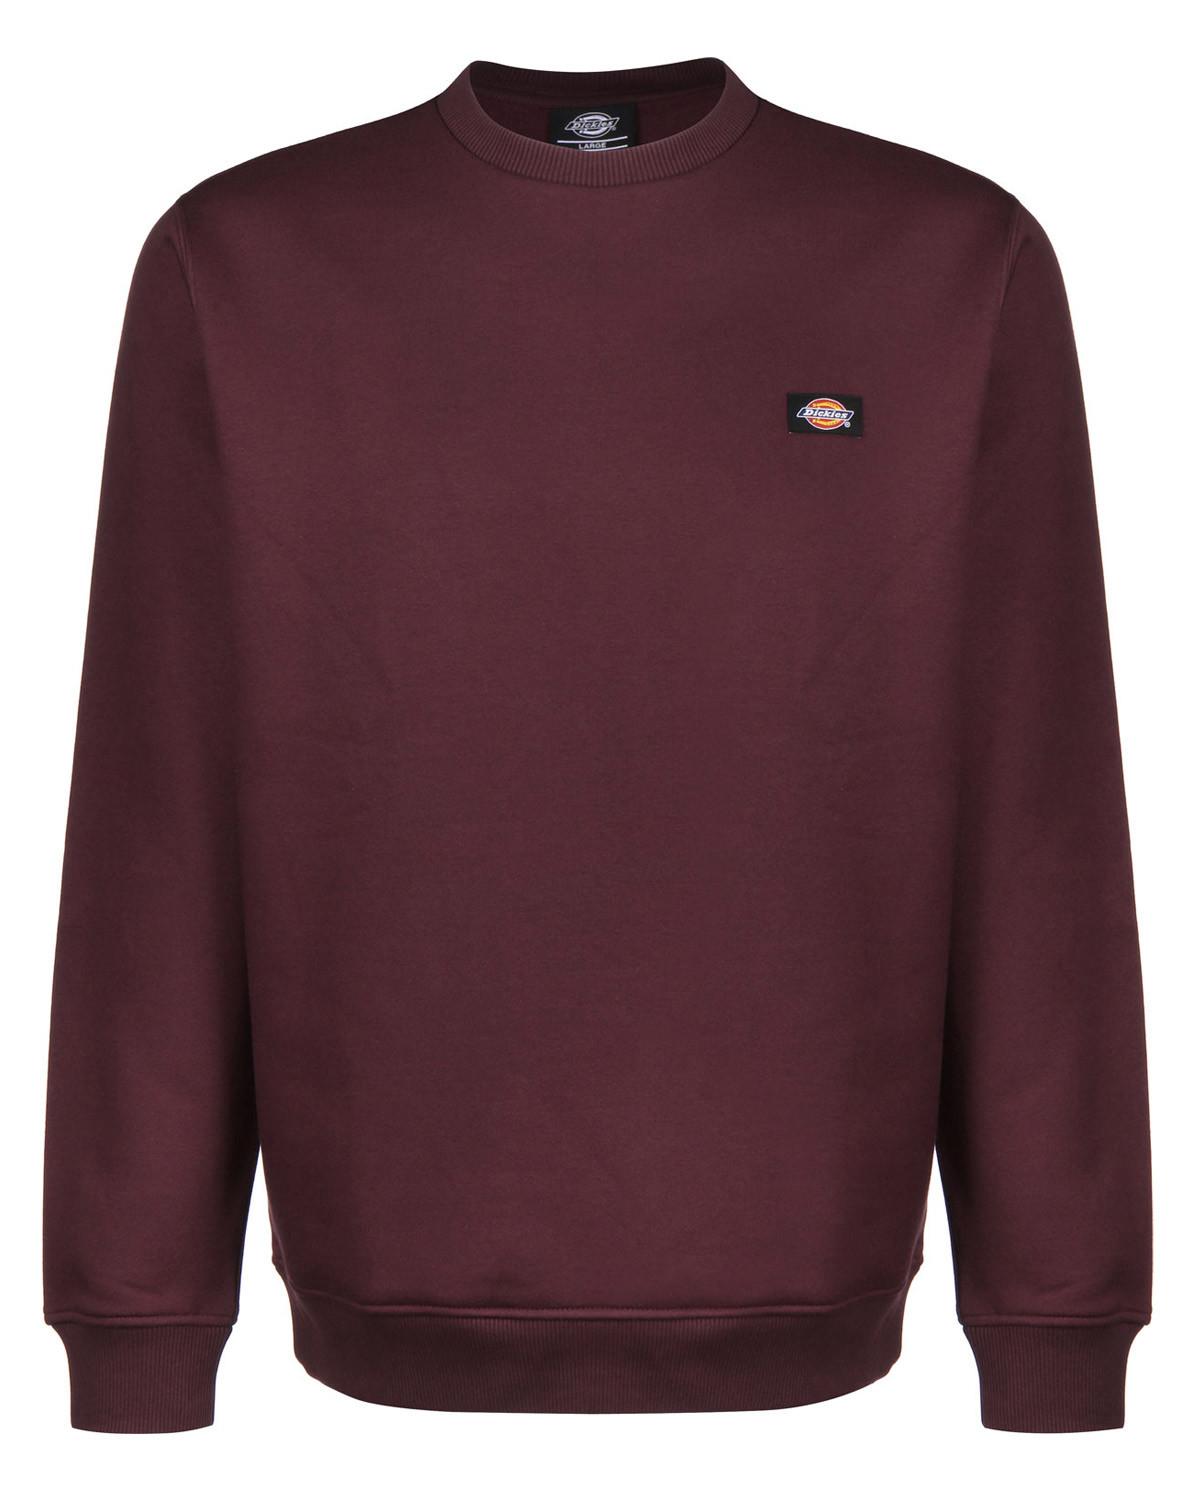 Image of   DICKIES New Jersey Sweatshirt (Maroon, 2XL)